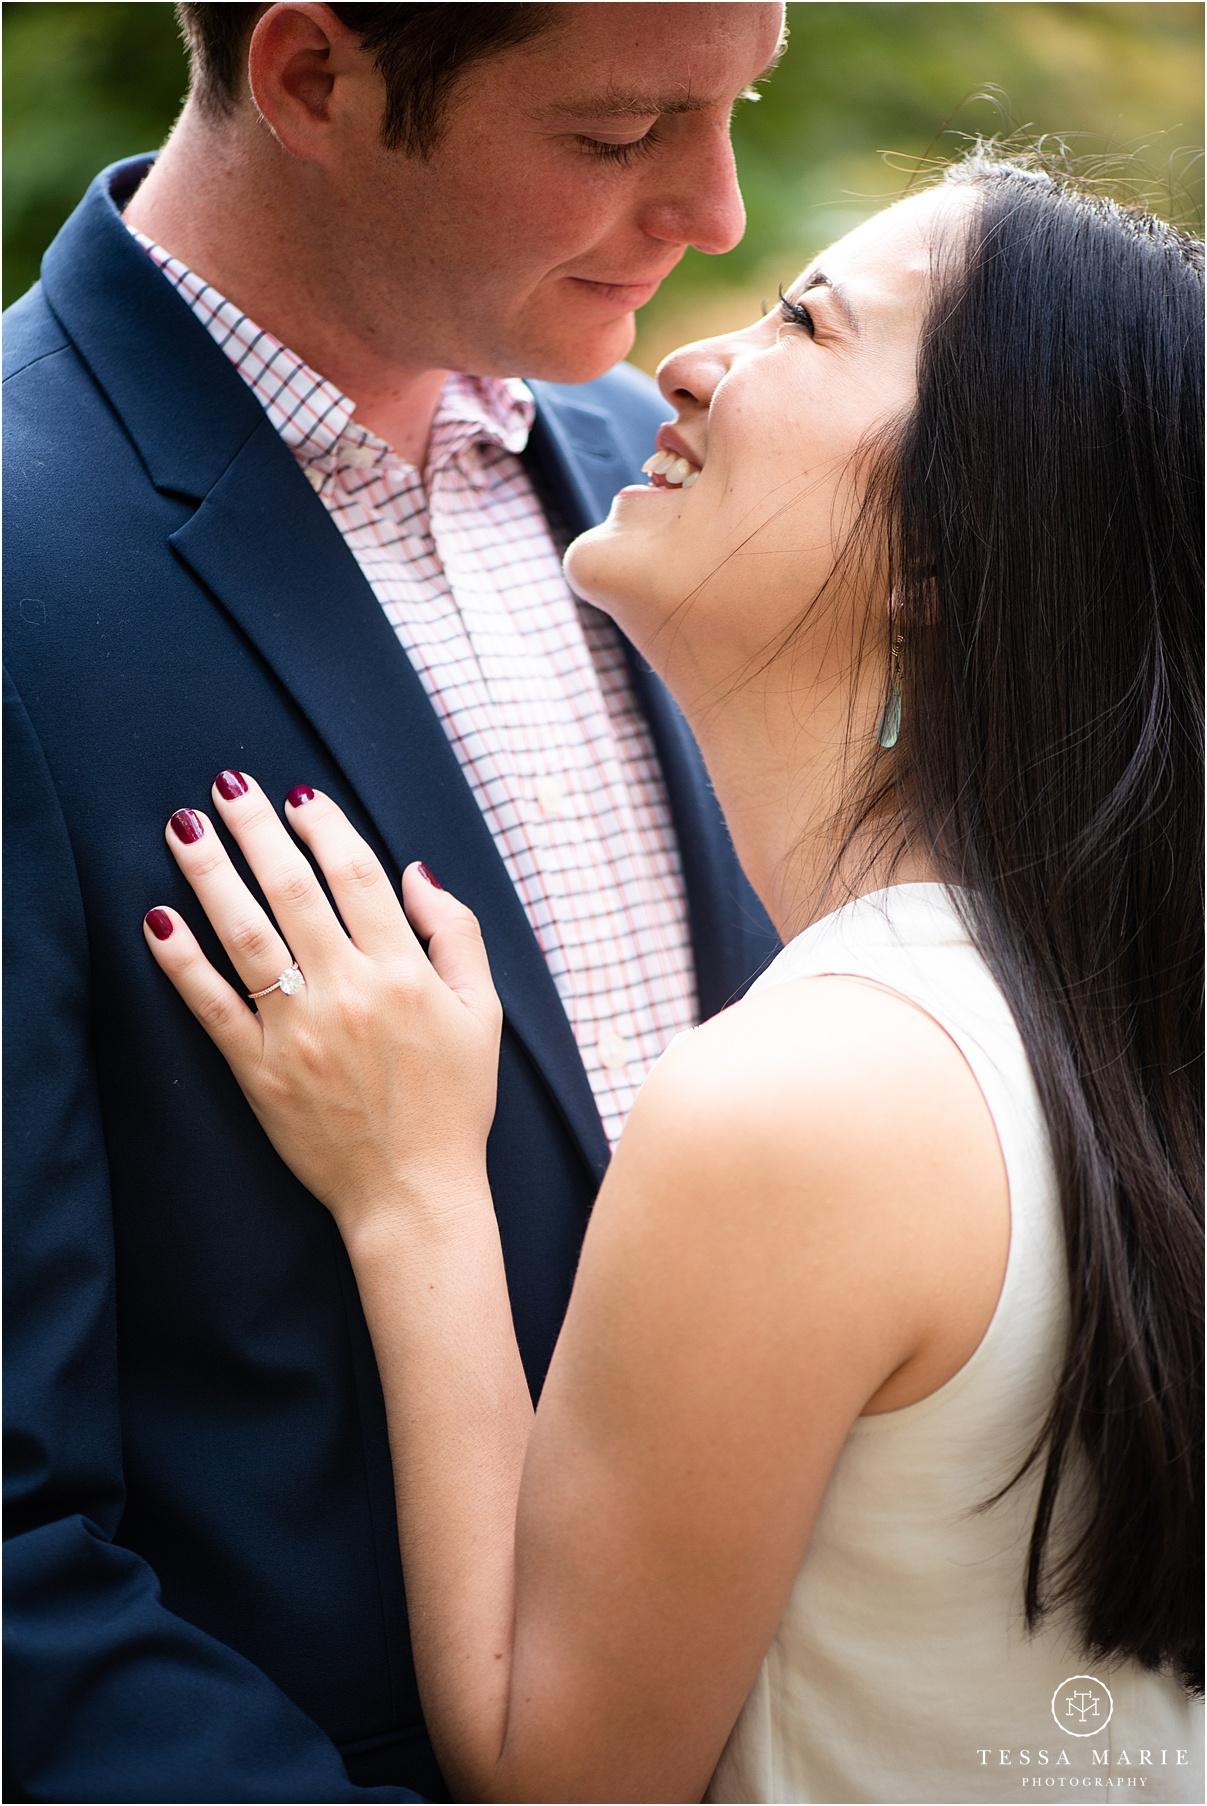 Tessa_marie_photography_wedding_photographer_engagement_pictures_piedmont_park_0051.jpg